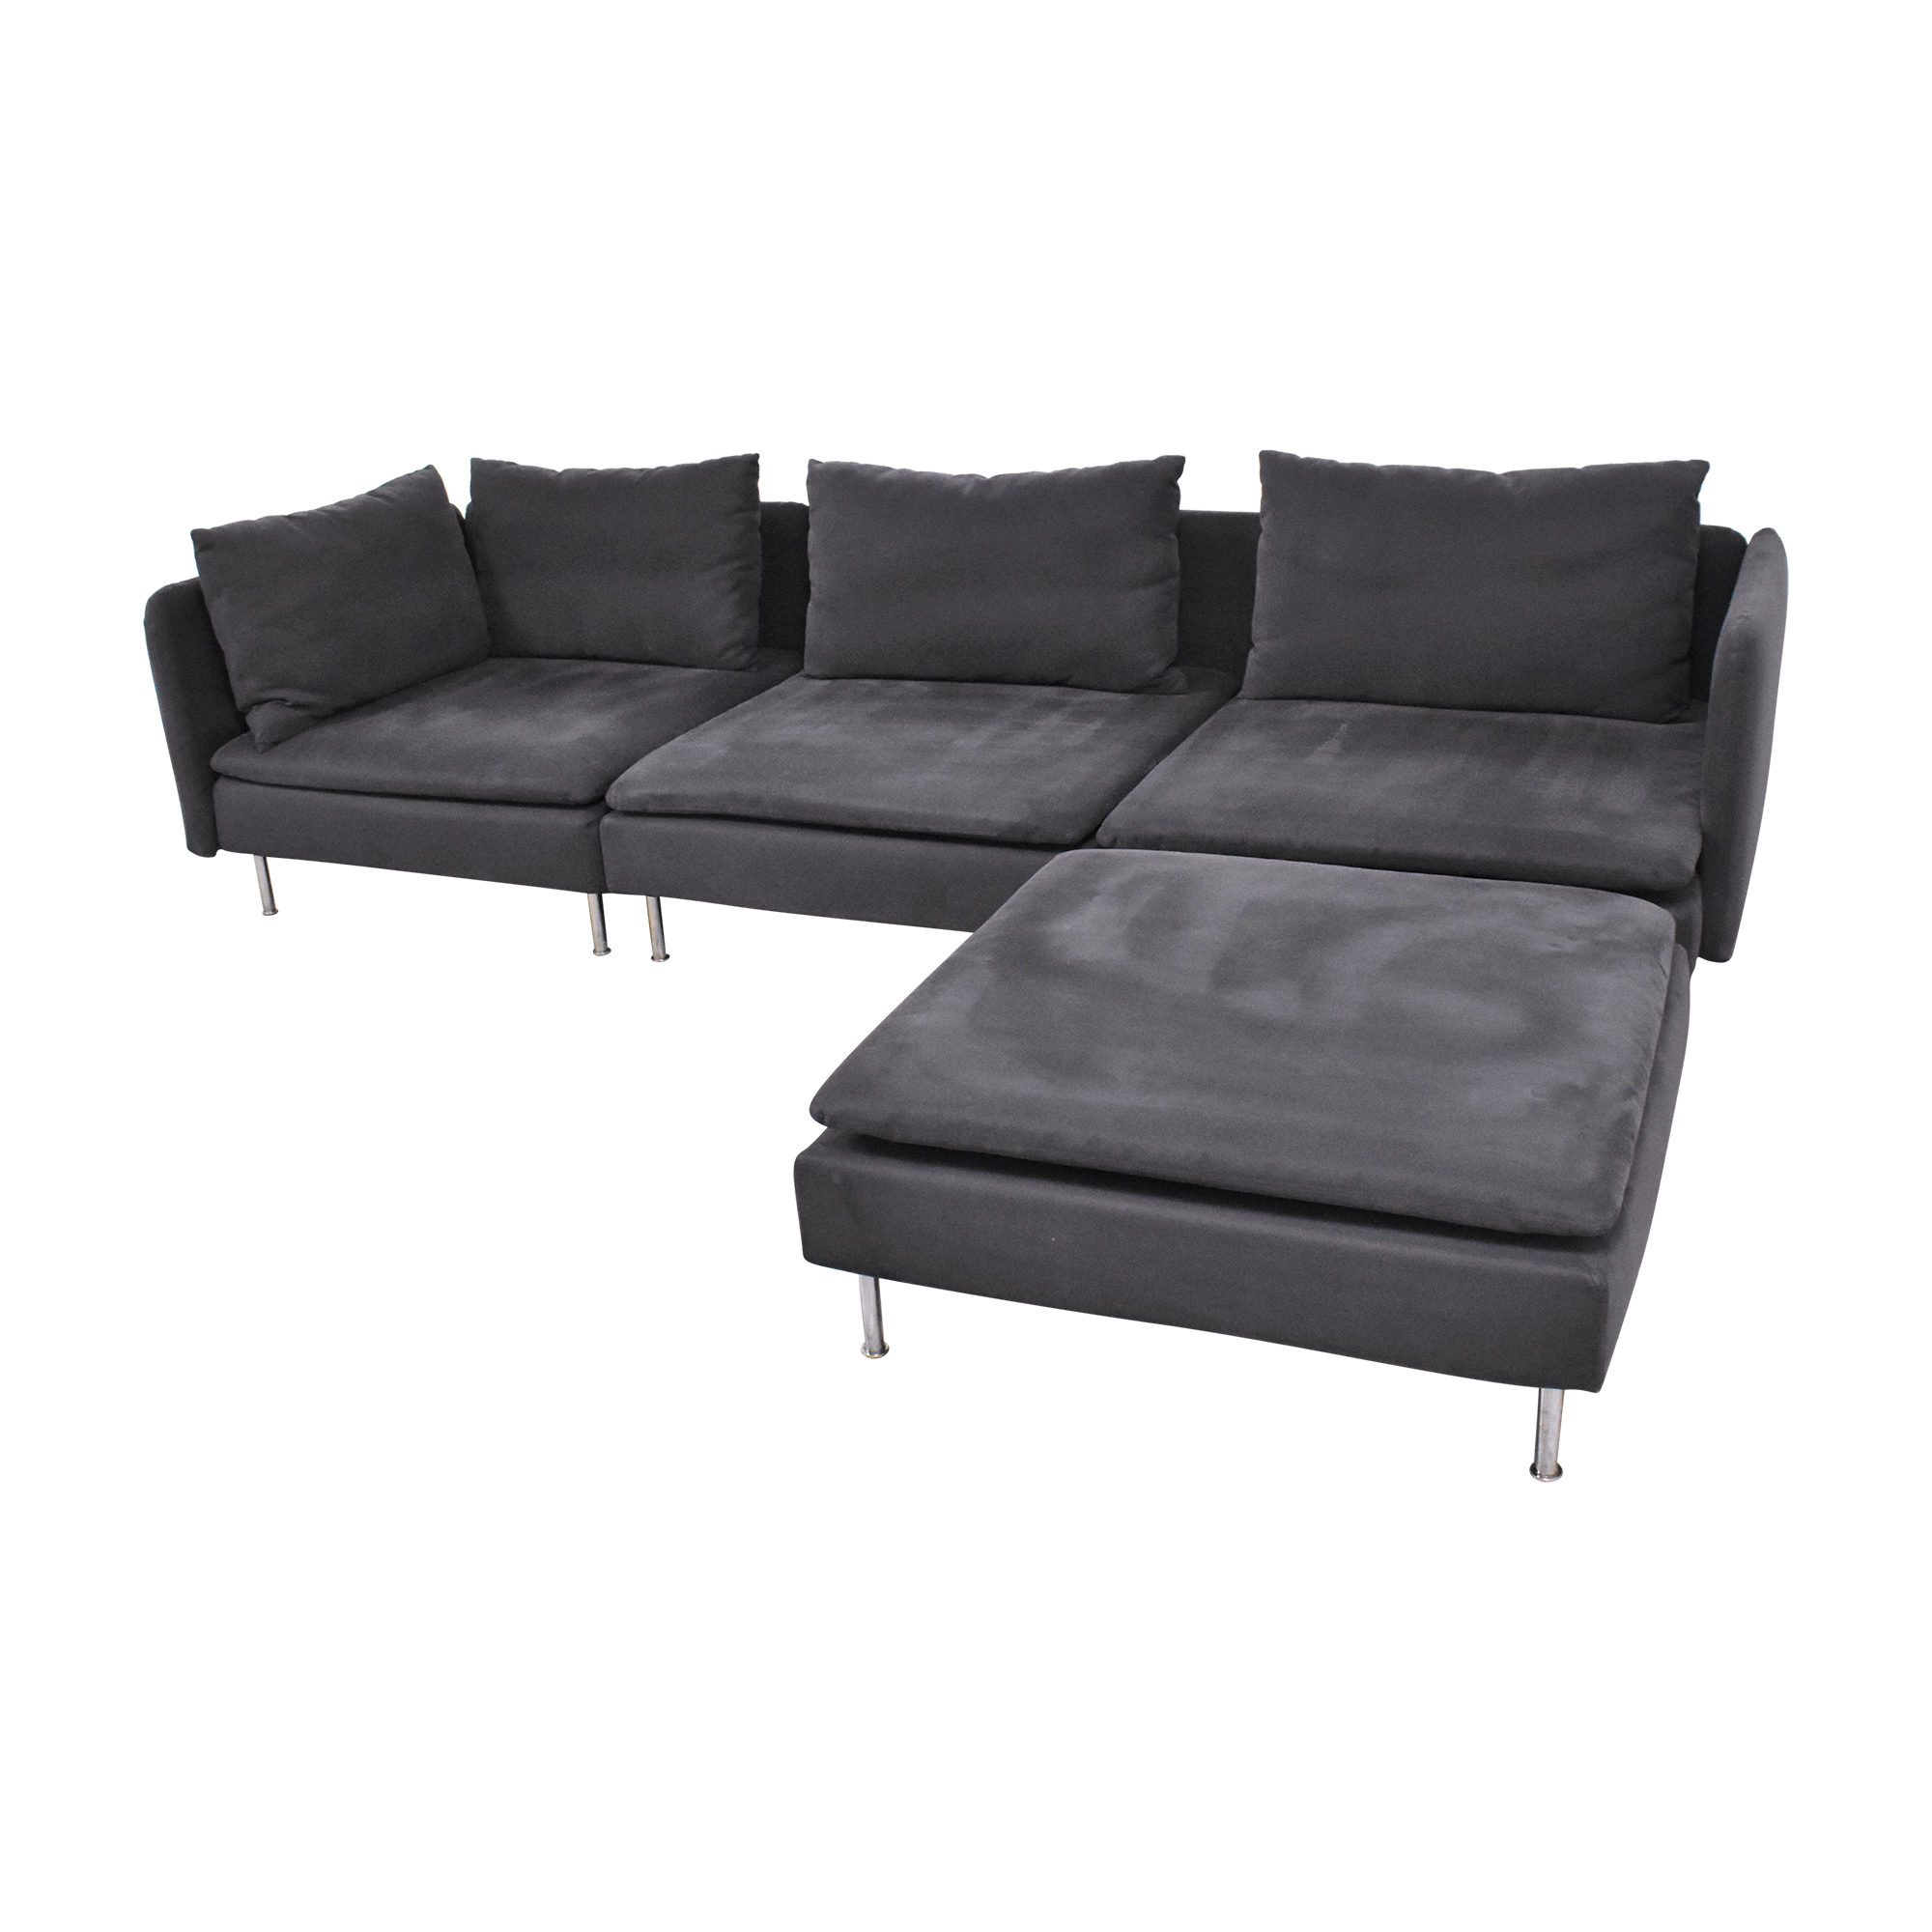 IKEA IKEA SÖDERHAMN Sectional Sofa with Ottoman second hand